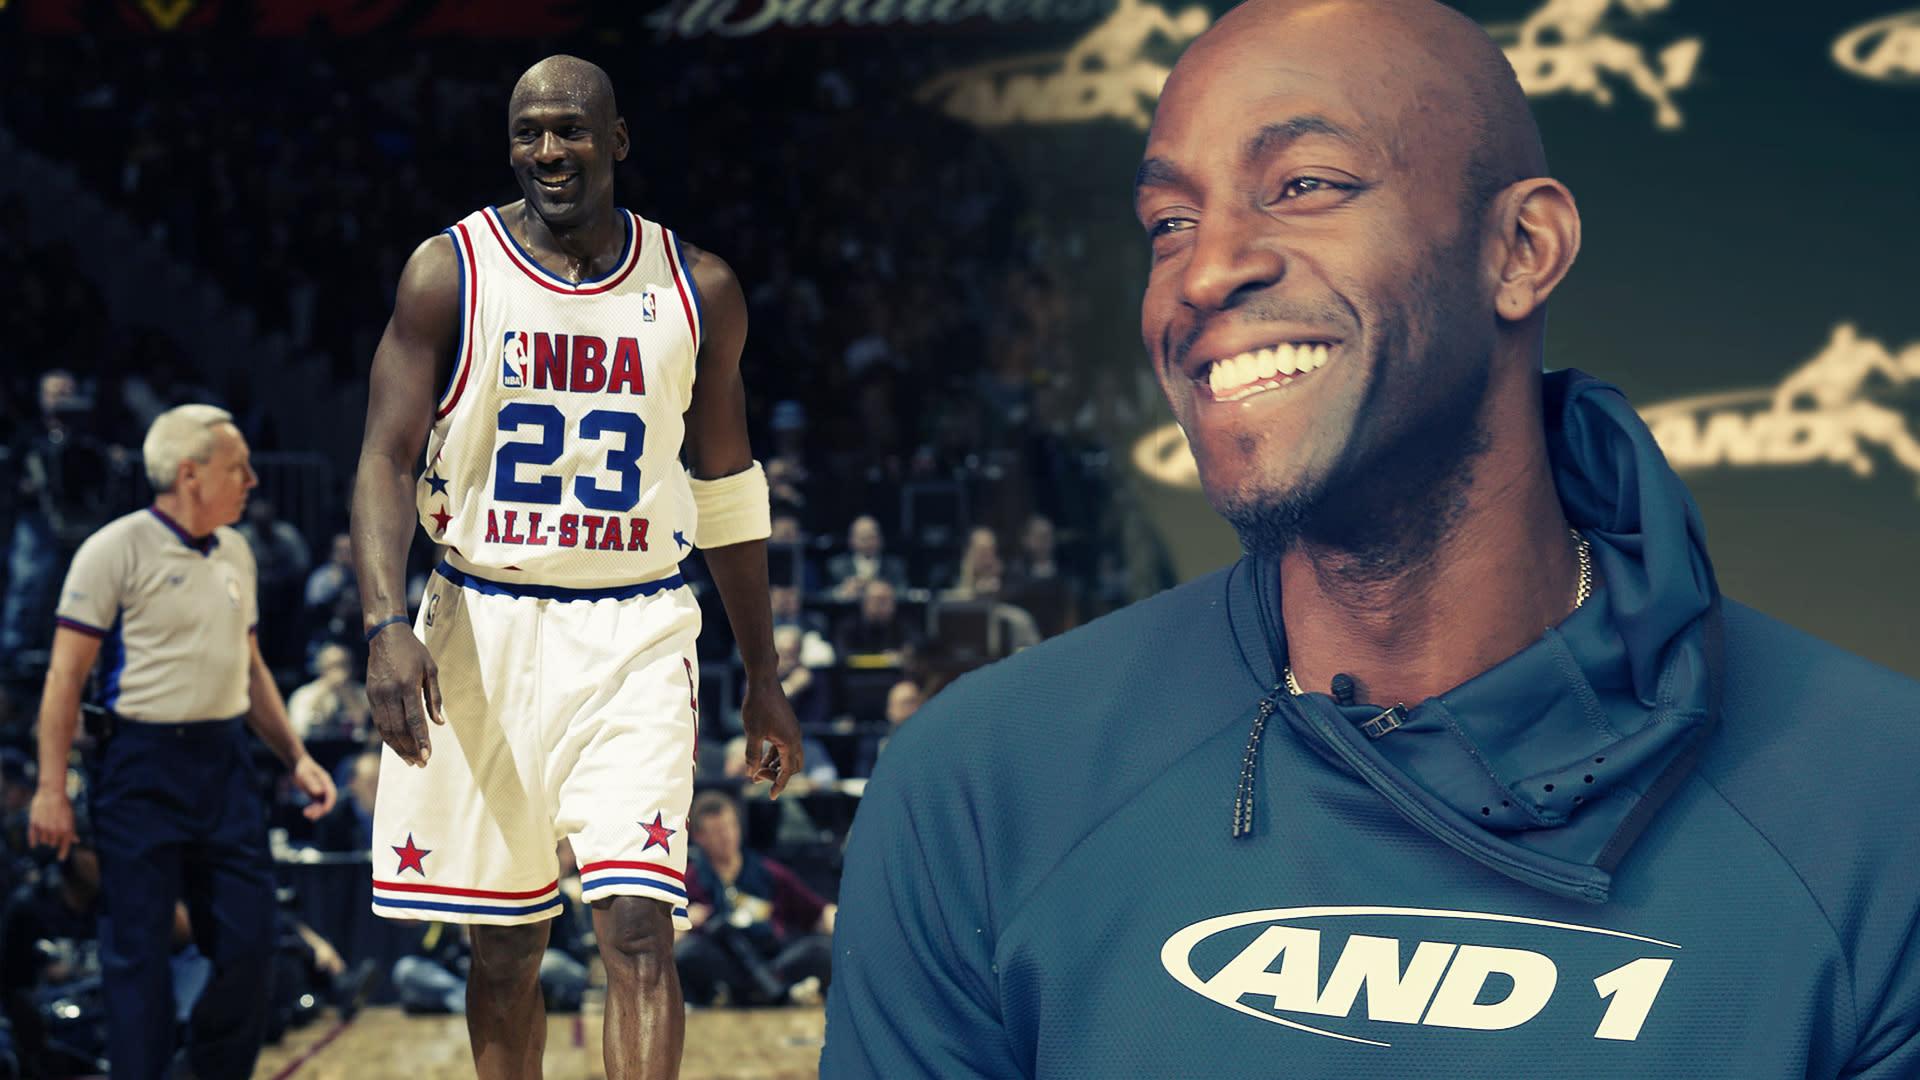 Kevin Garnett dishes on beating Michael Jordan in the legend's final All-Star game